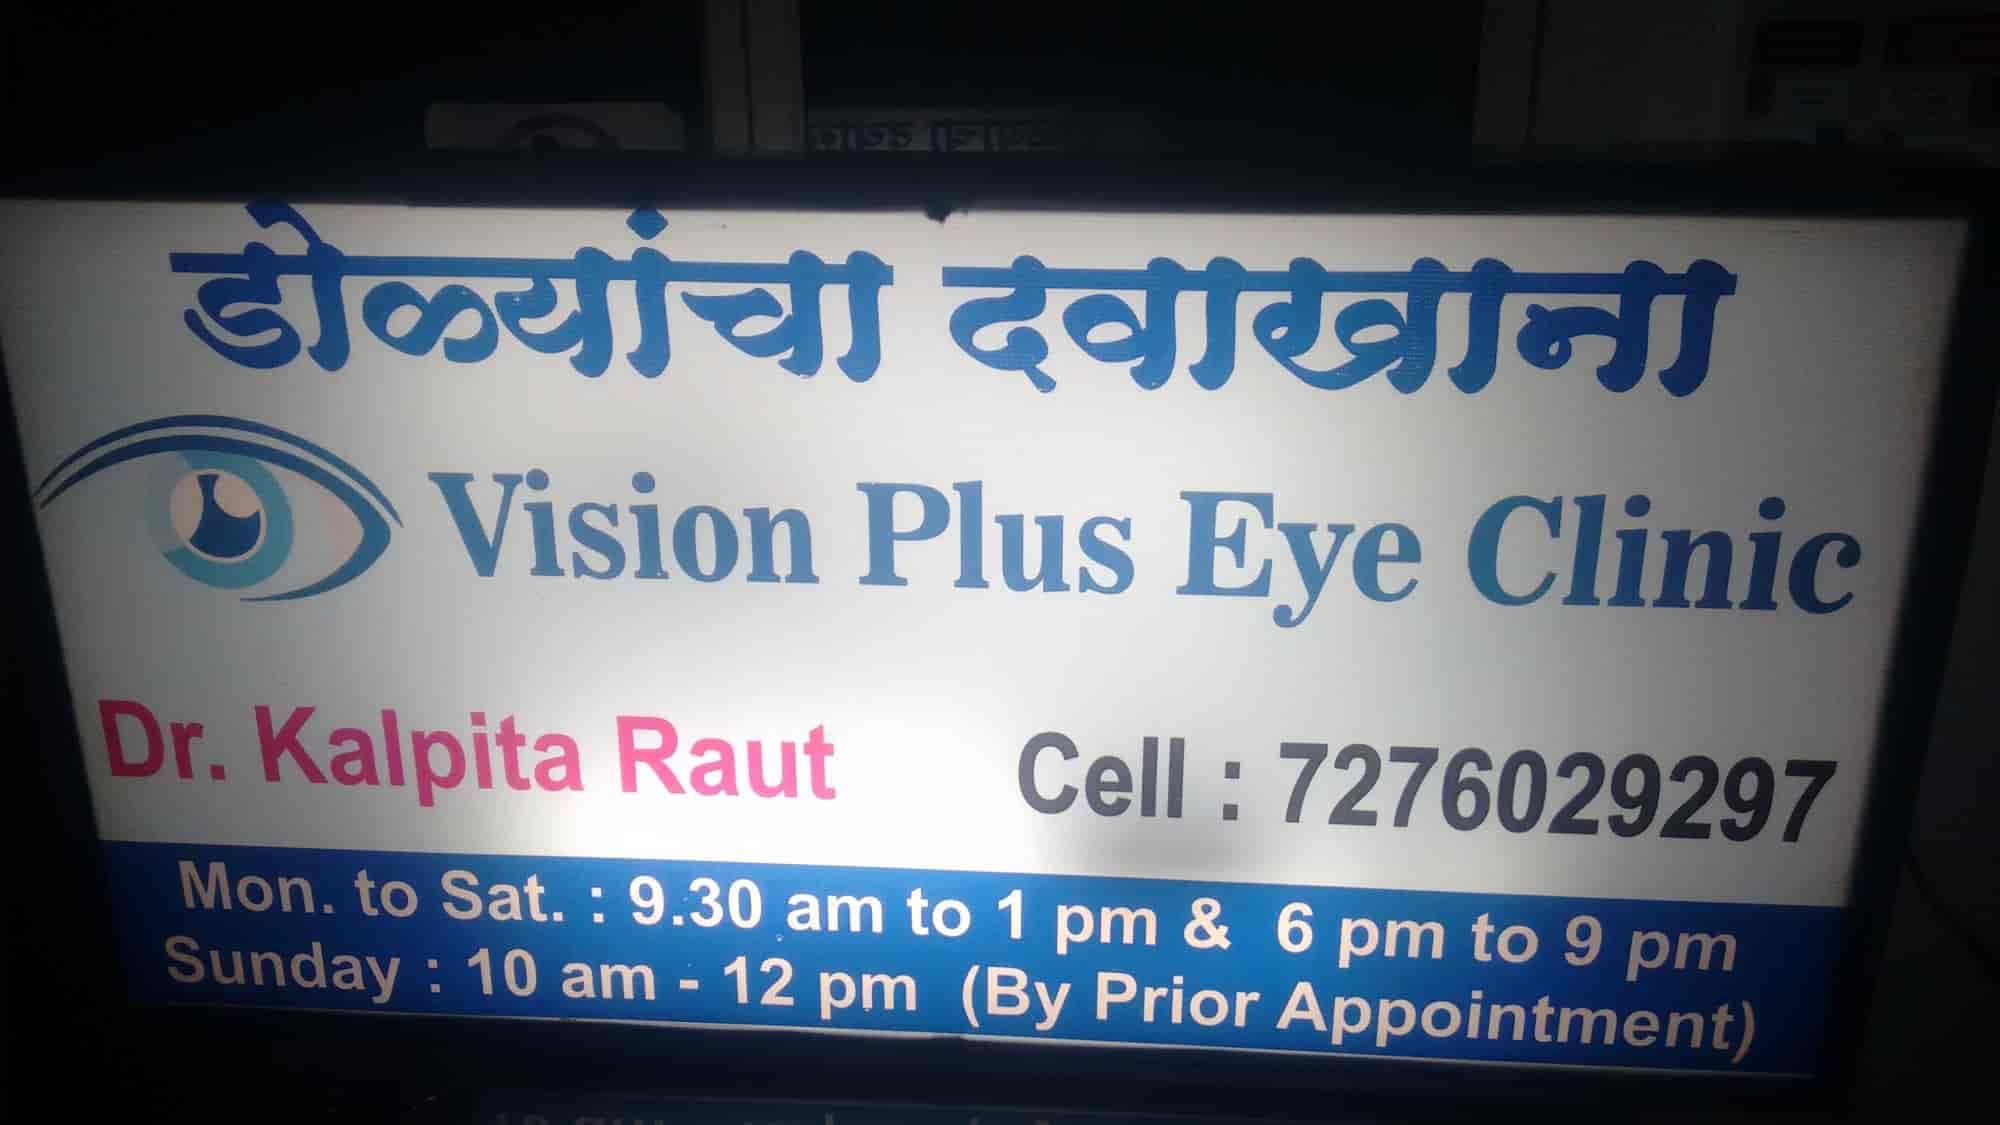 eaec84189d1 Dr. Kalpita Bhushan Raut (Vision Plus Eye Clinic)